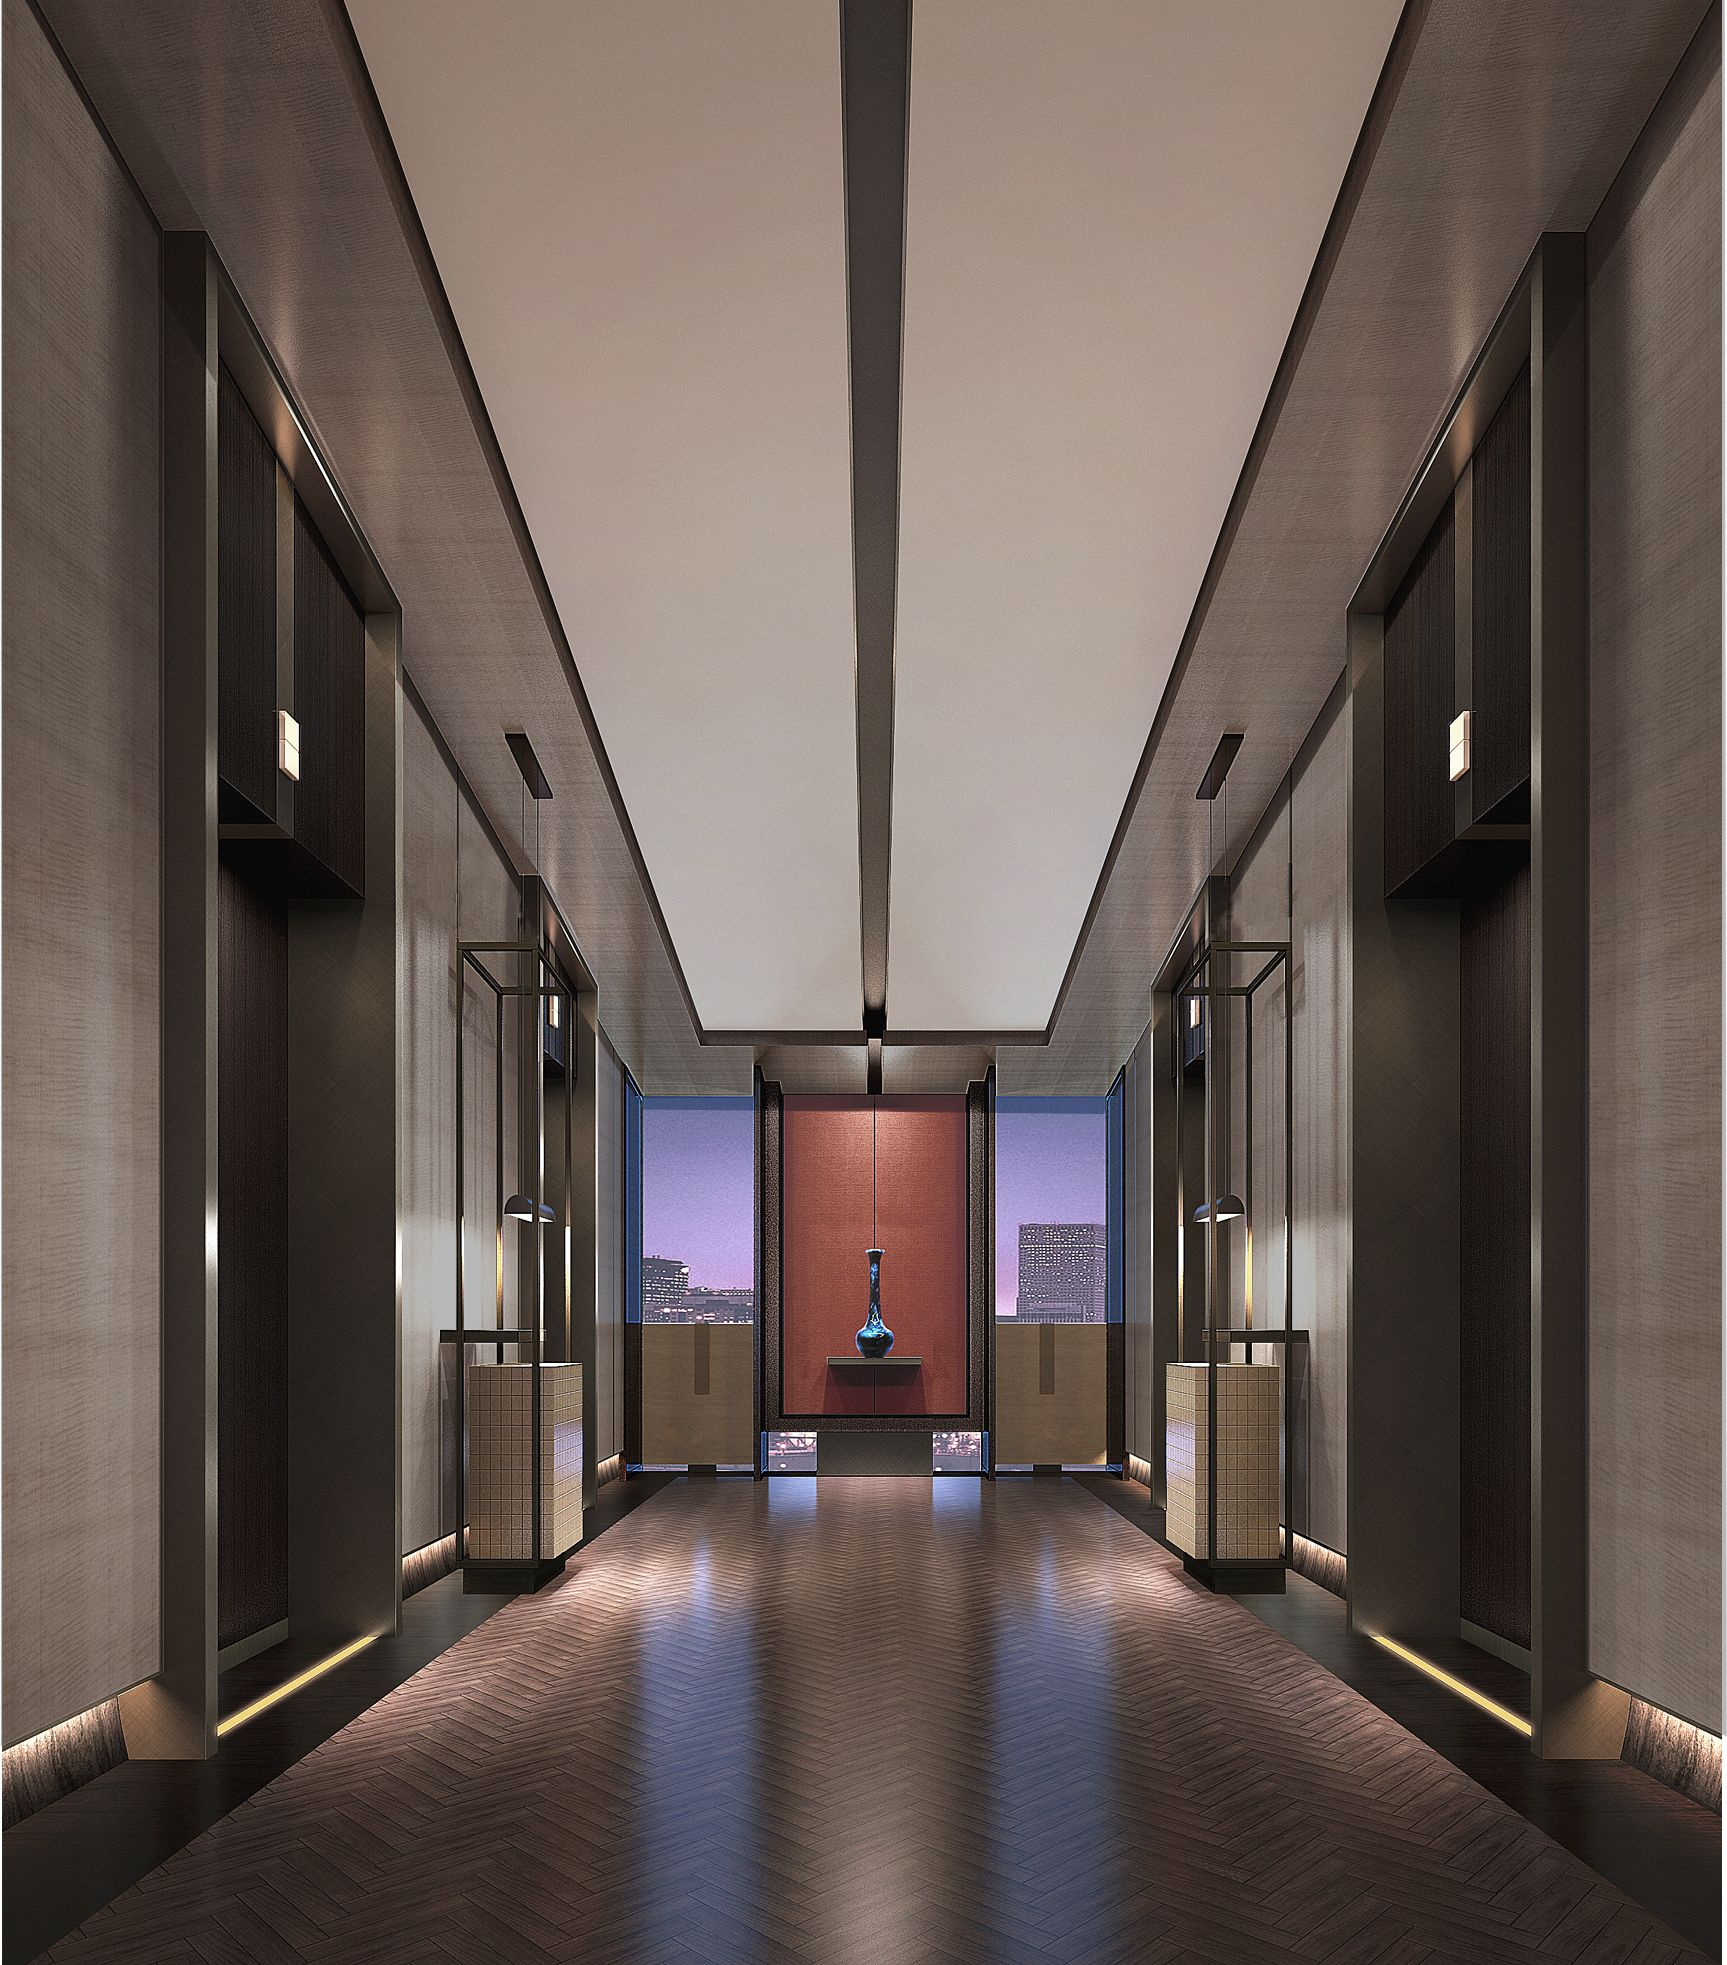 Lobby Interior Design: Fly Fish Ɣ�藏于 Ņ�共区域